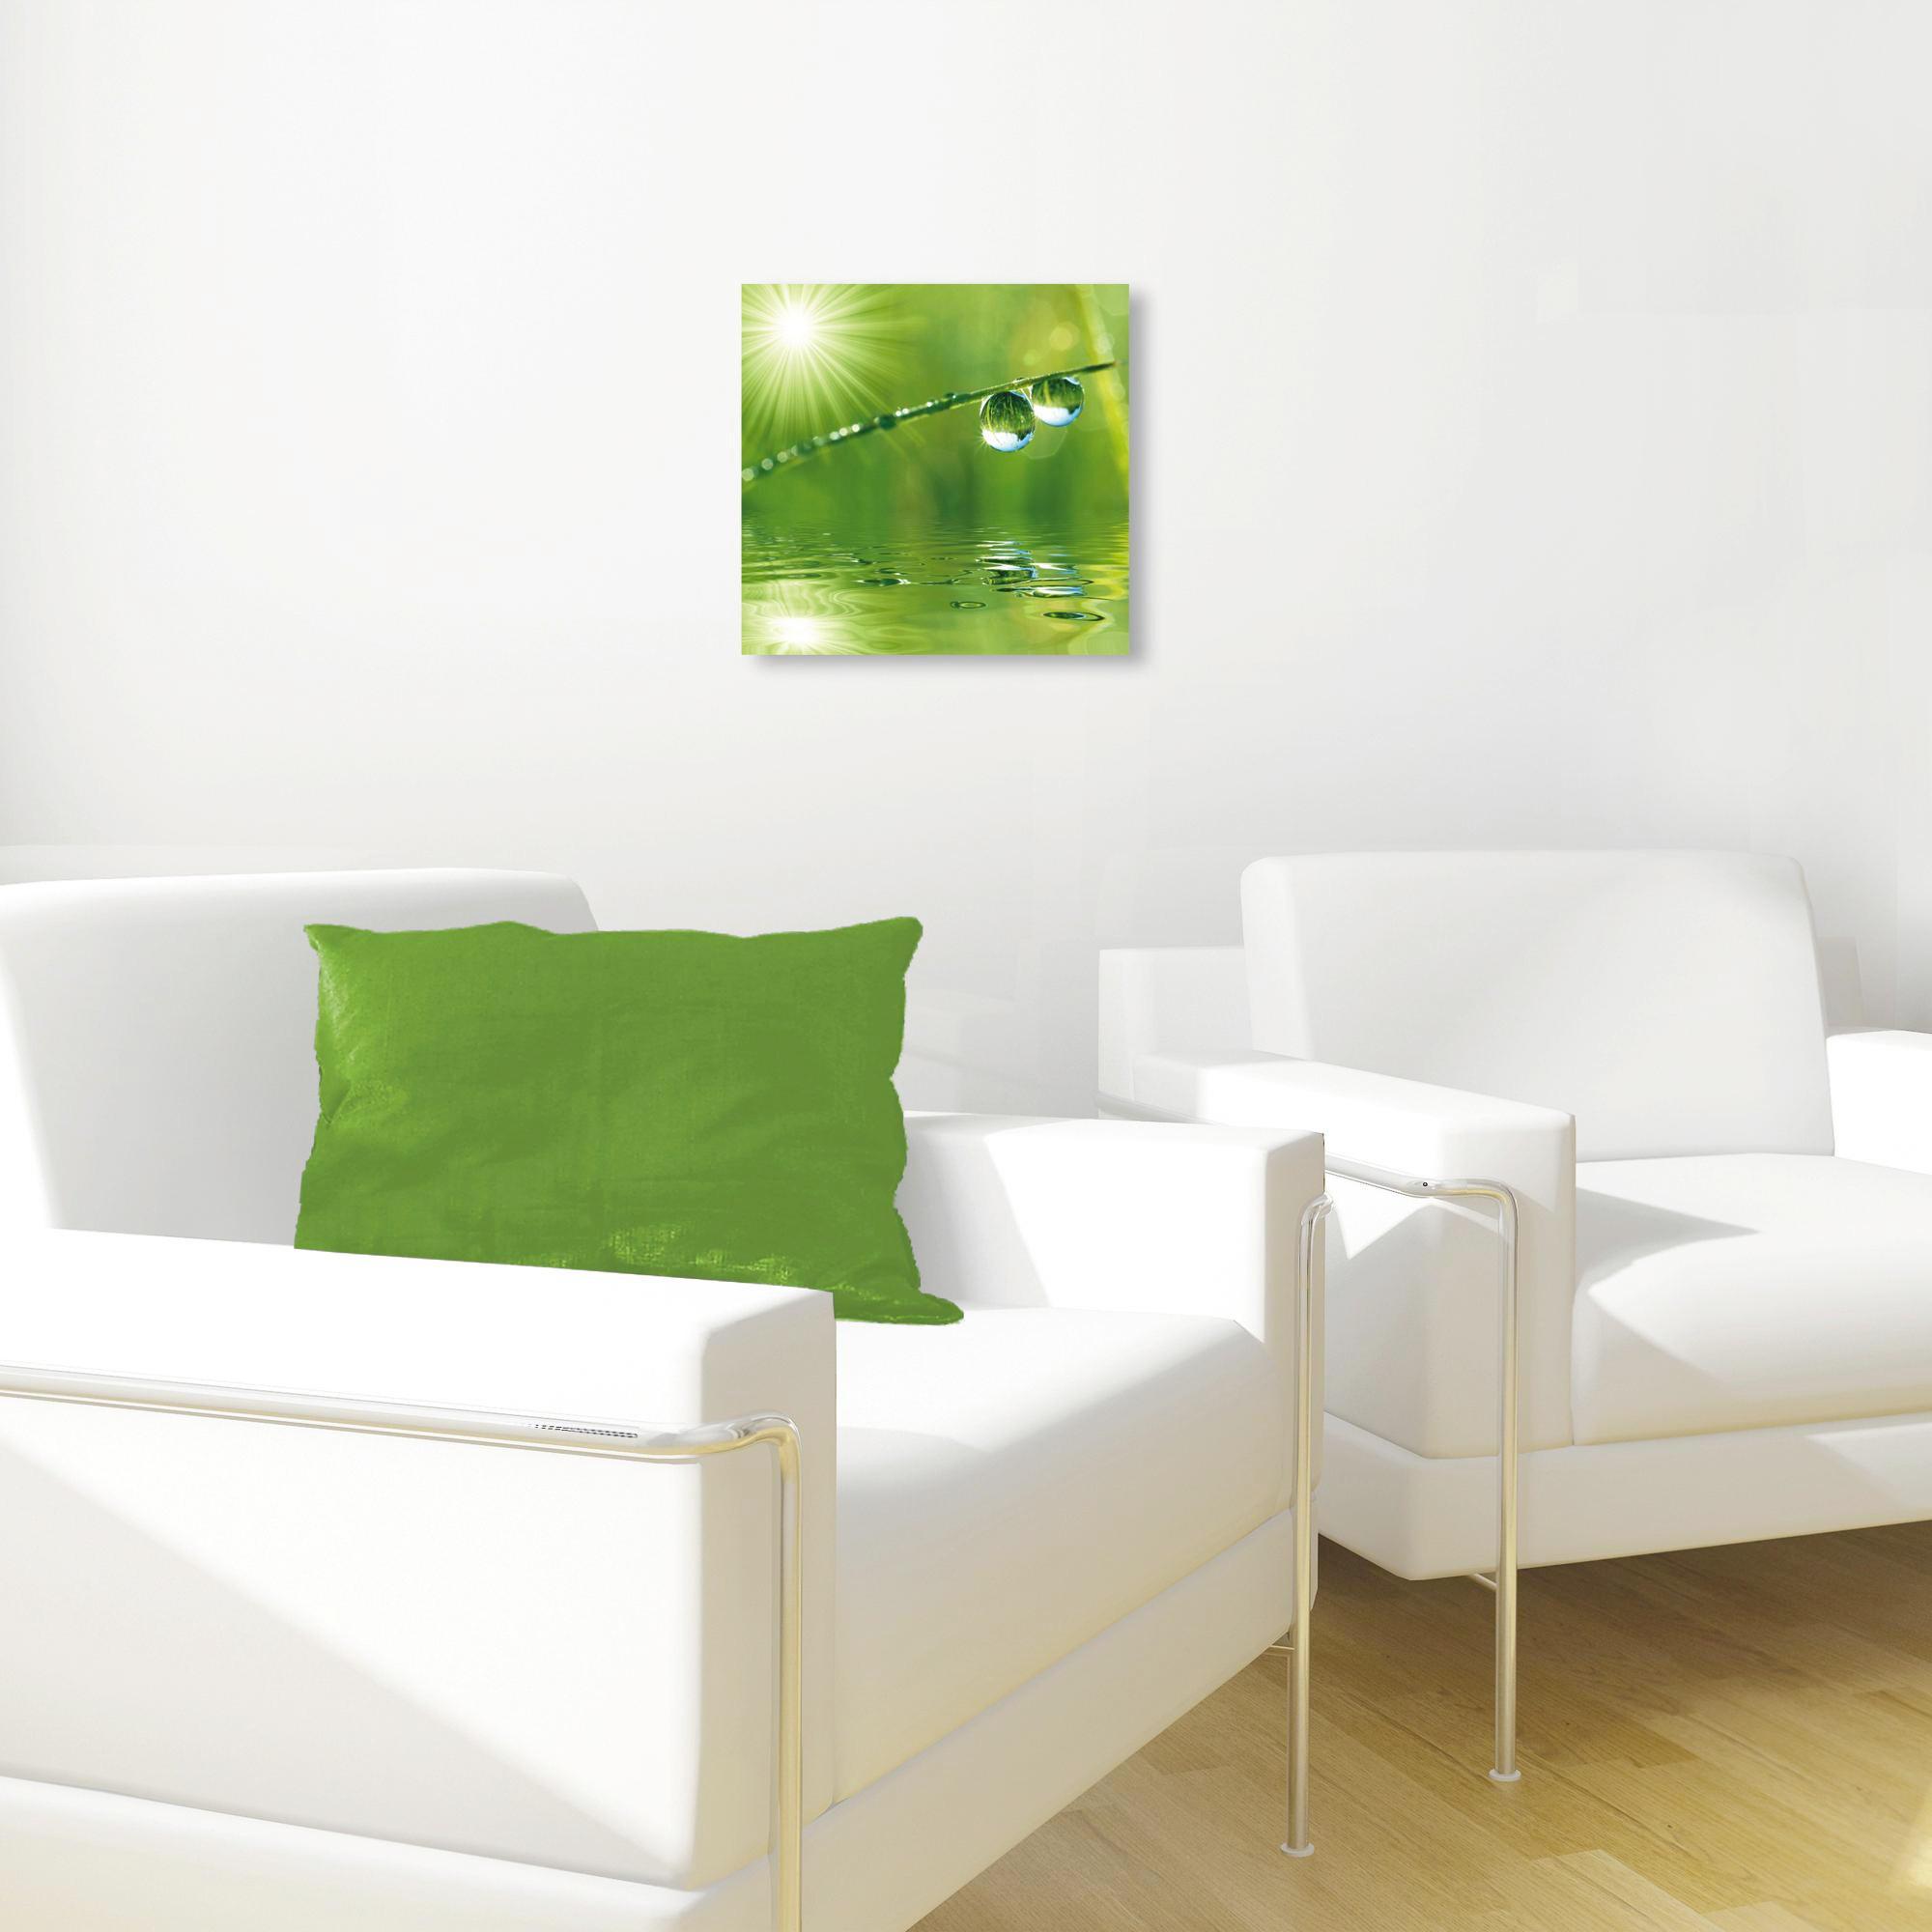 GLASTAVLA - multicolor, Basics, glas (30/30cm) - EUROGRAPHICS